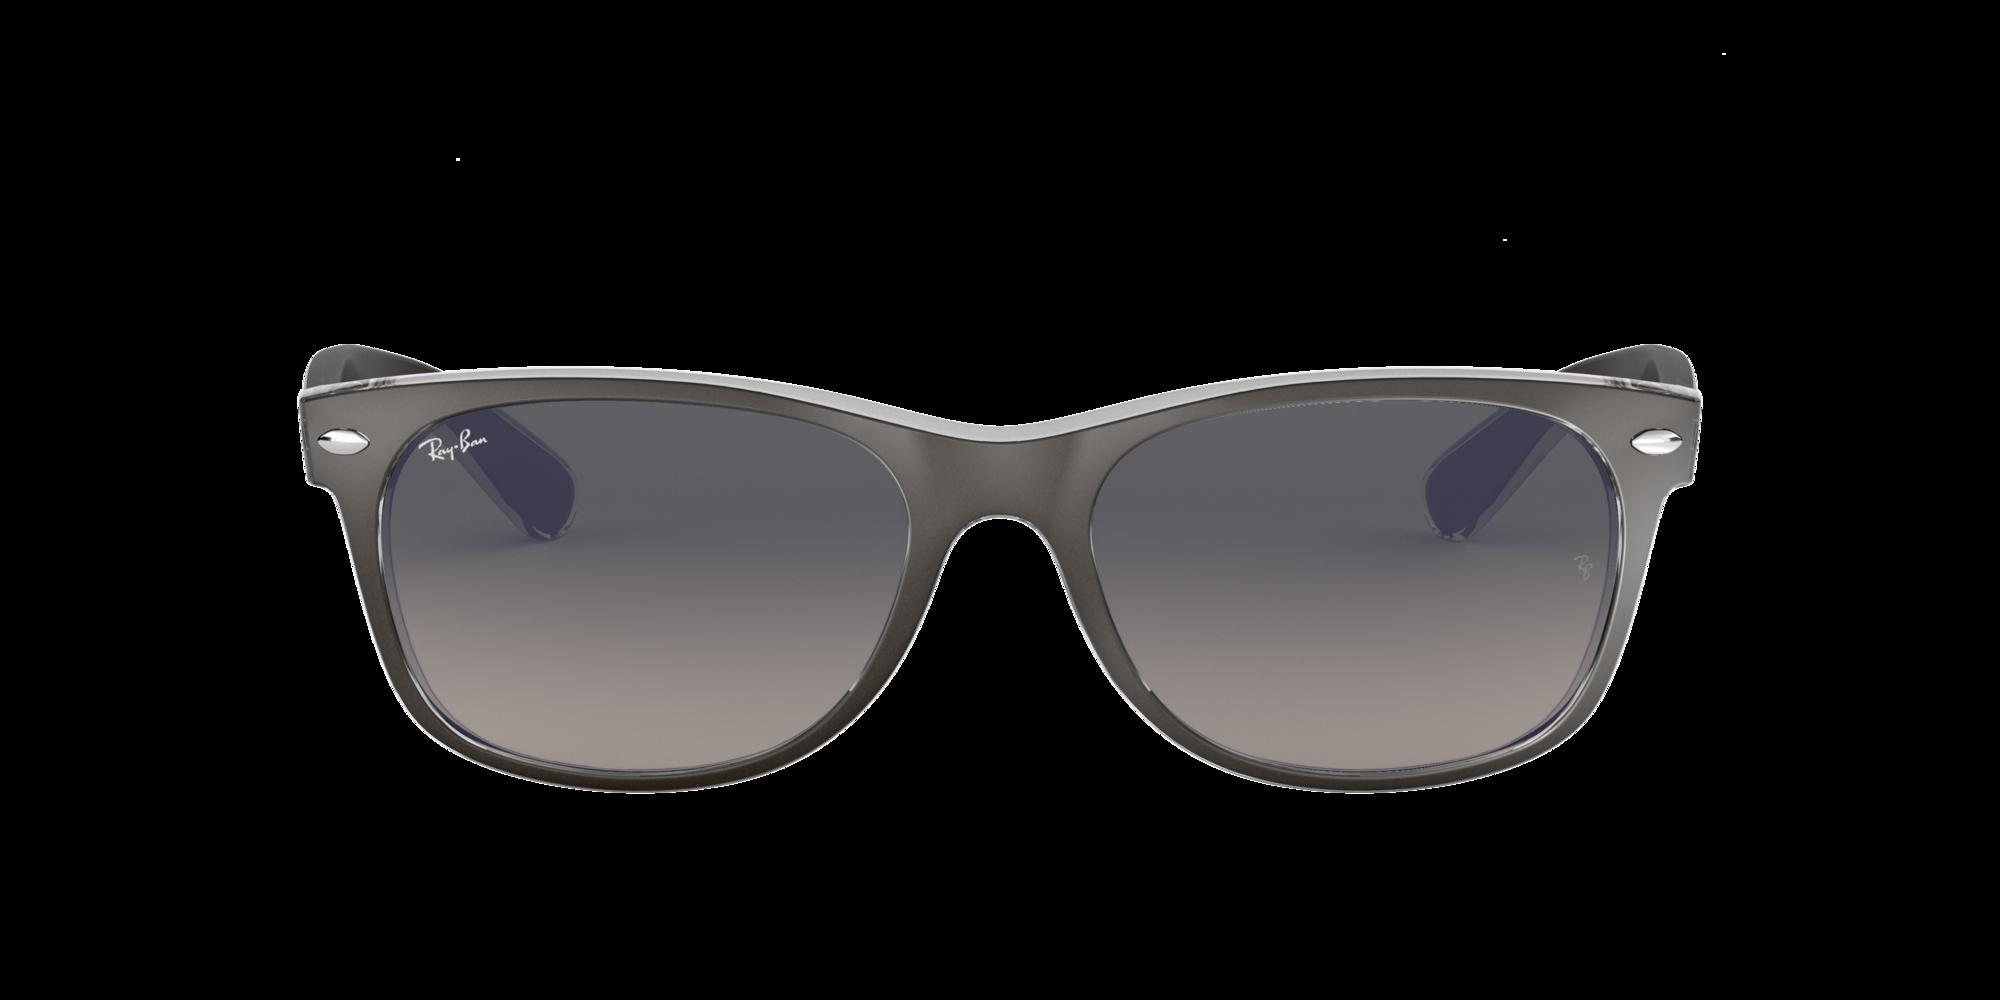 Image for RB2132 55 NEW WAYFARER from LensCrafters | Glasses, Prescription Glasses Online, Eyewear